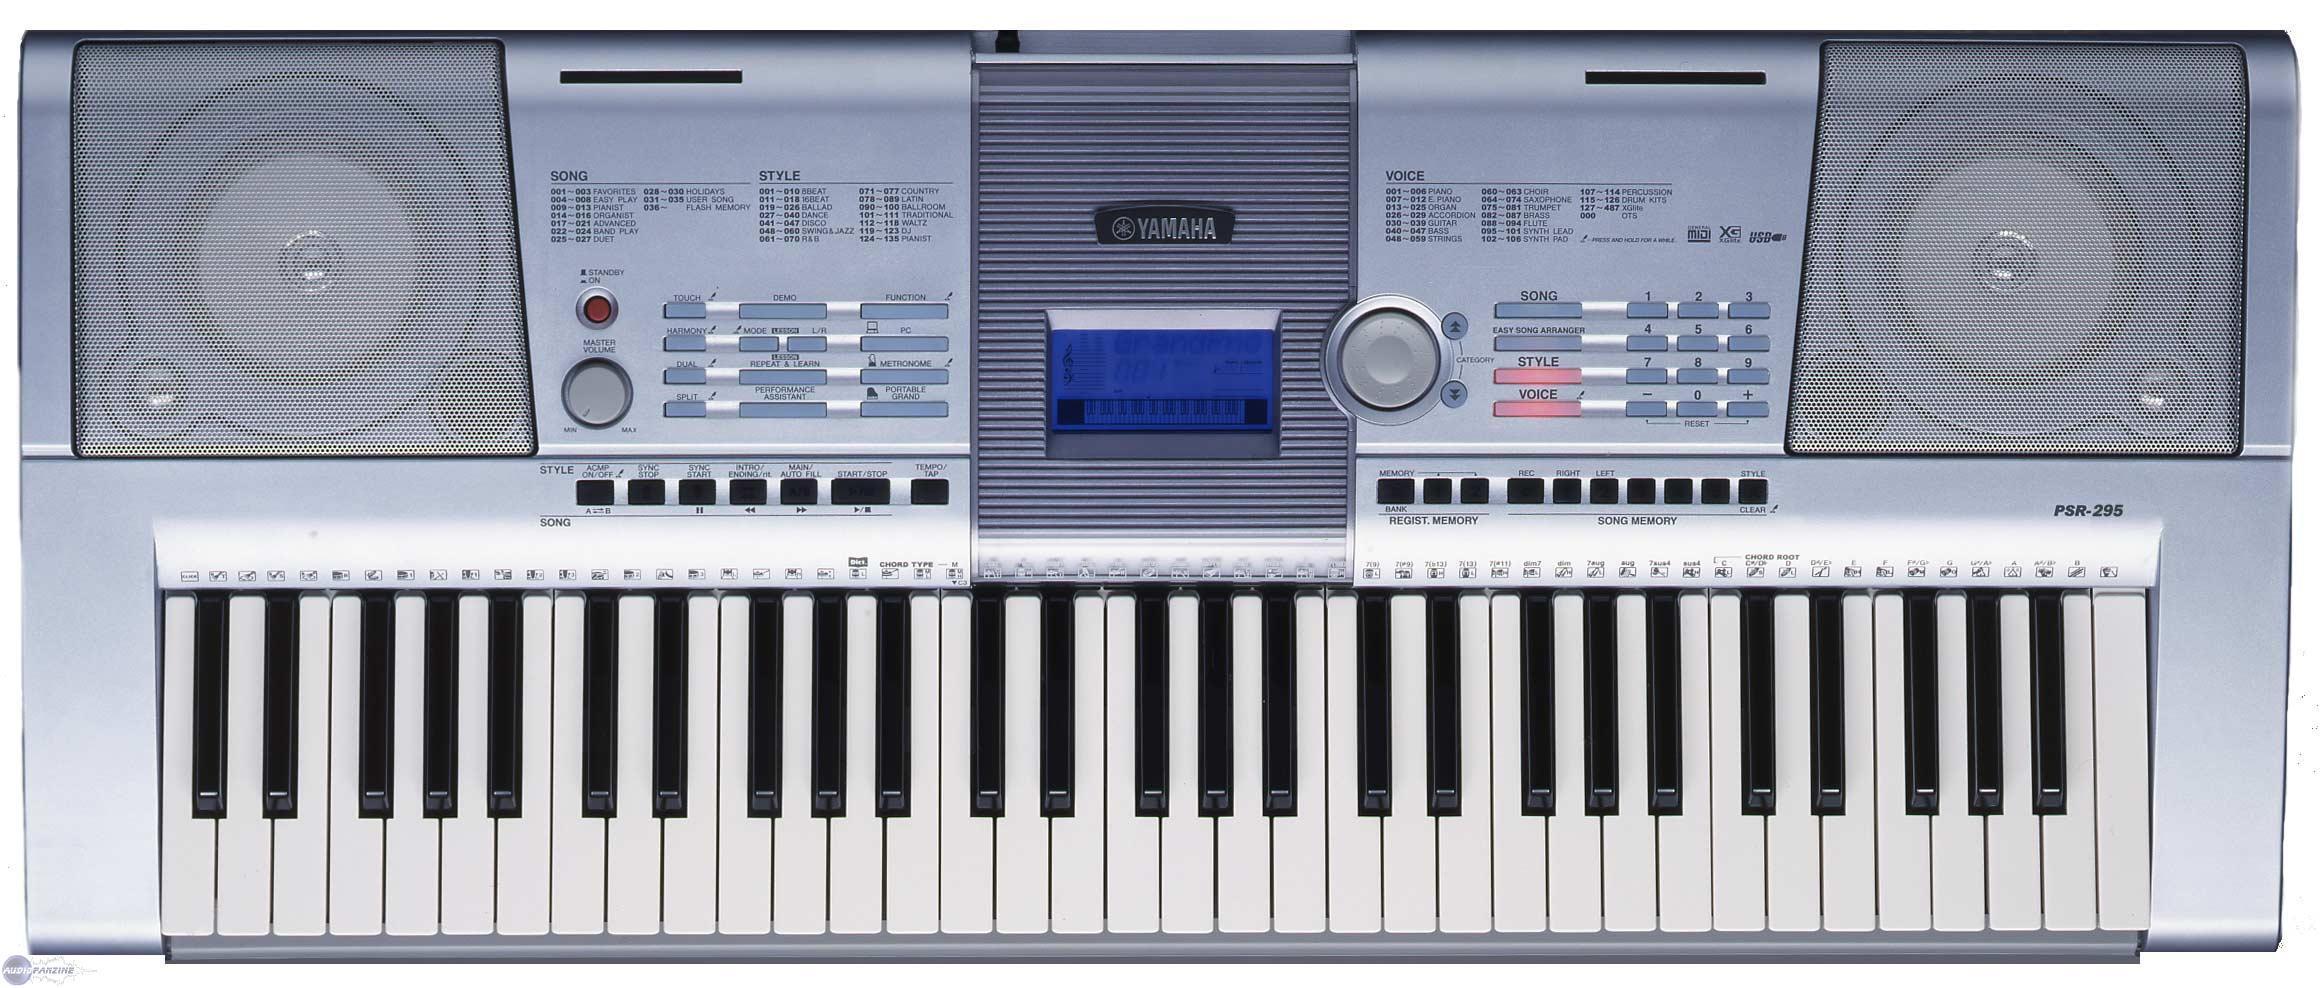 La Presentation De Yamaha Dgx Keyboard